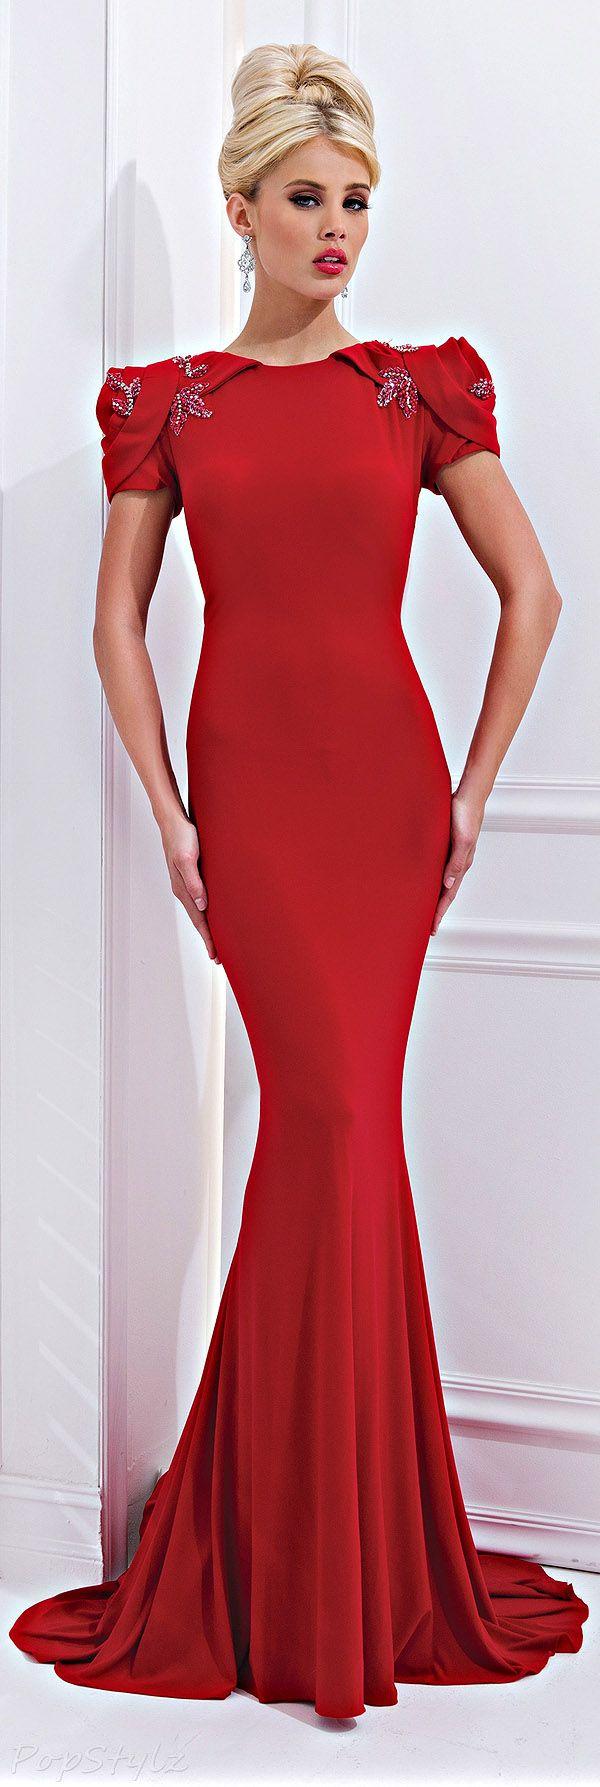 Tony bowls gorgeous red evening gown so elegant fashion